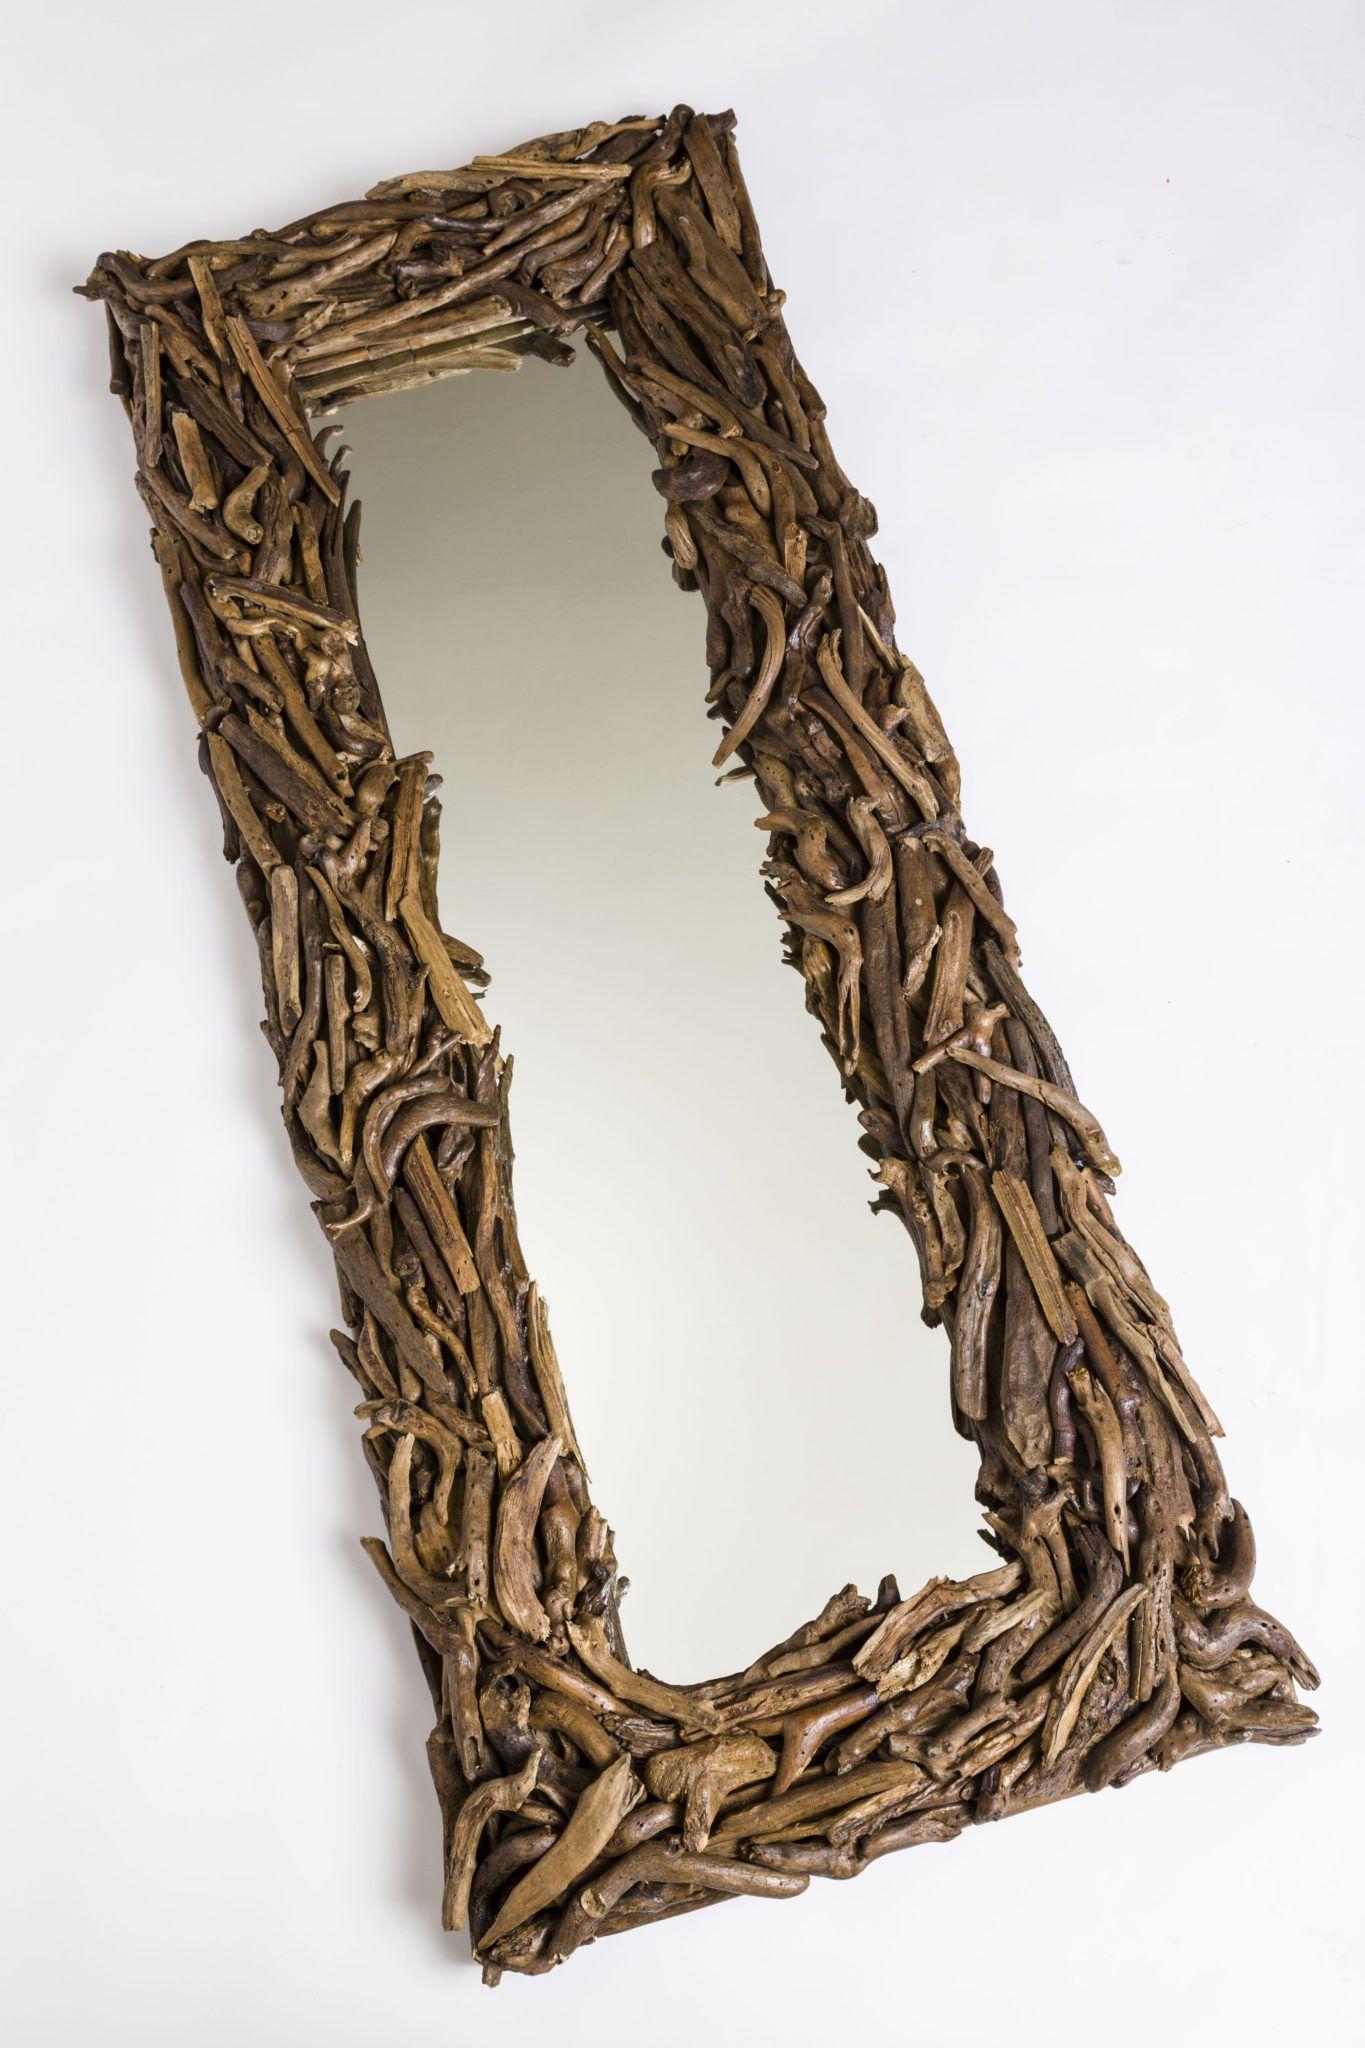 driftwood-rectangular-mirror-swatch